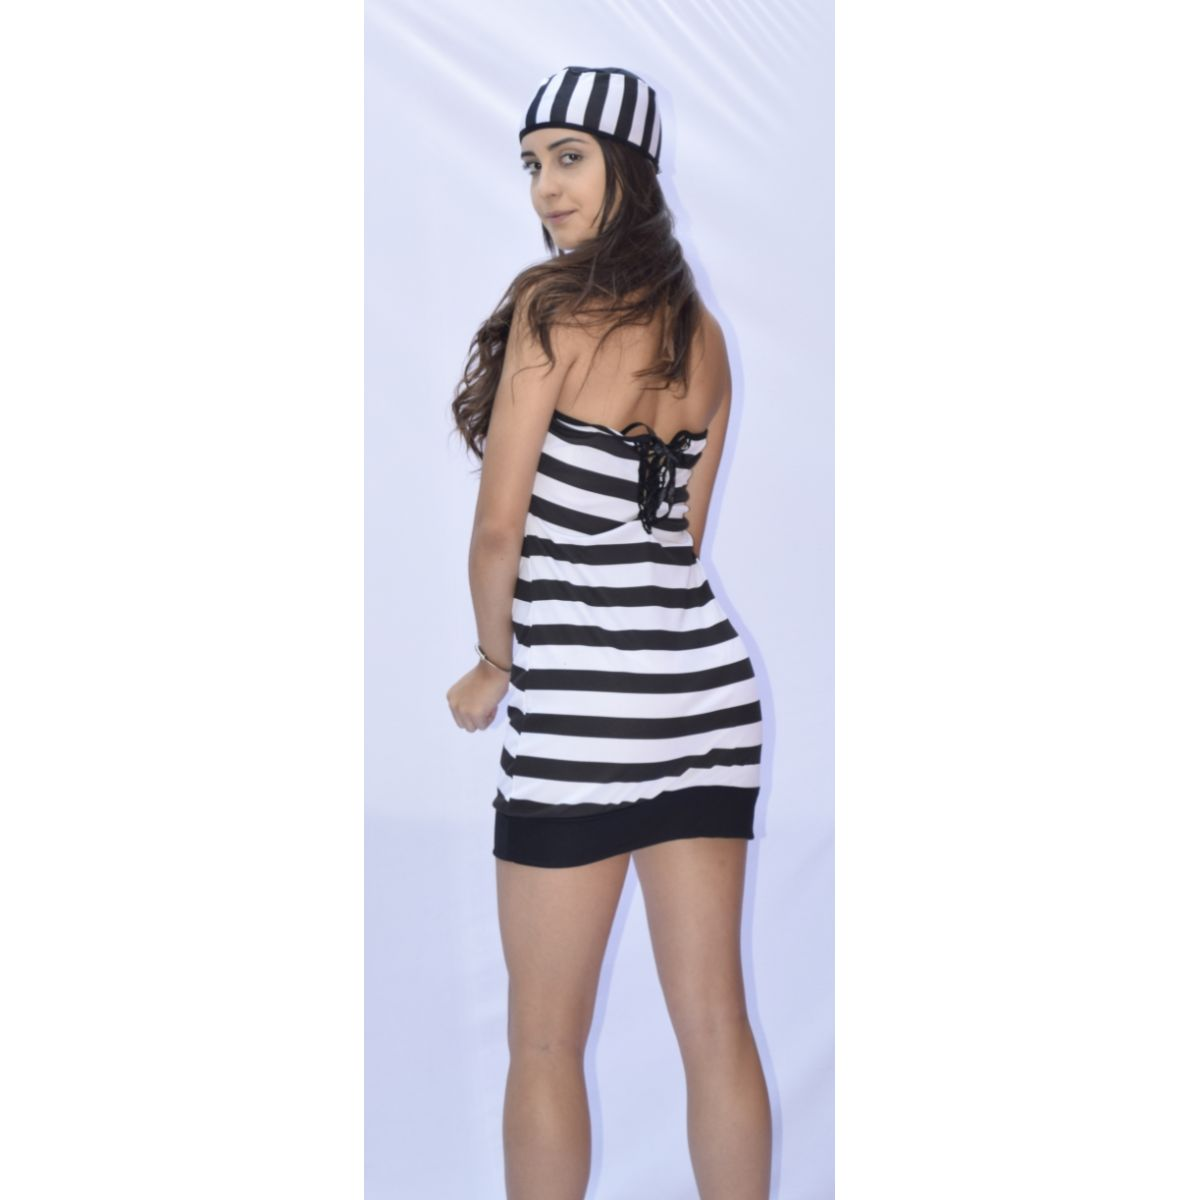 Fantasia Presidiária - Adulto - Point Da Dança - fantasia para festa carnaval